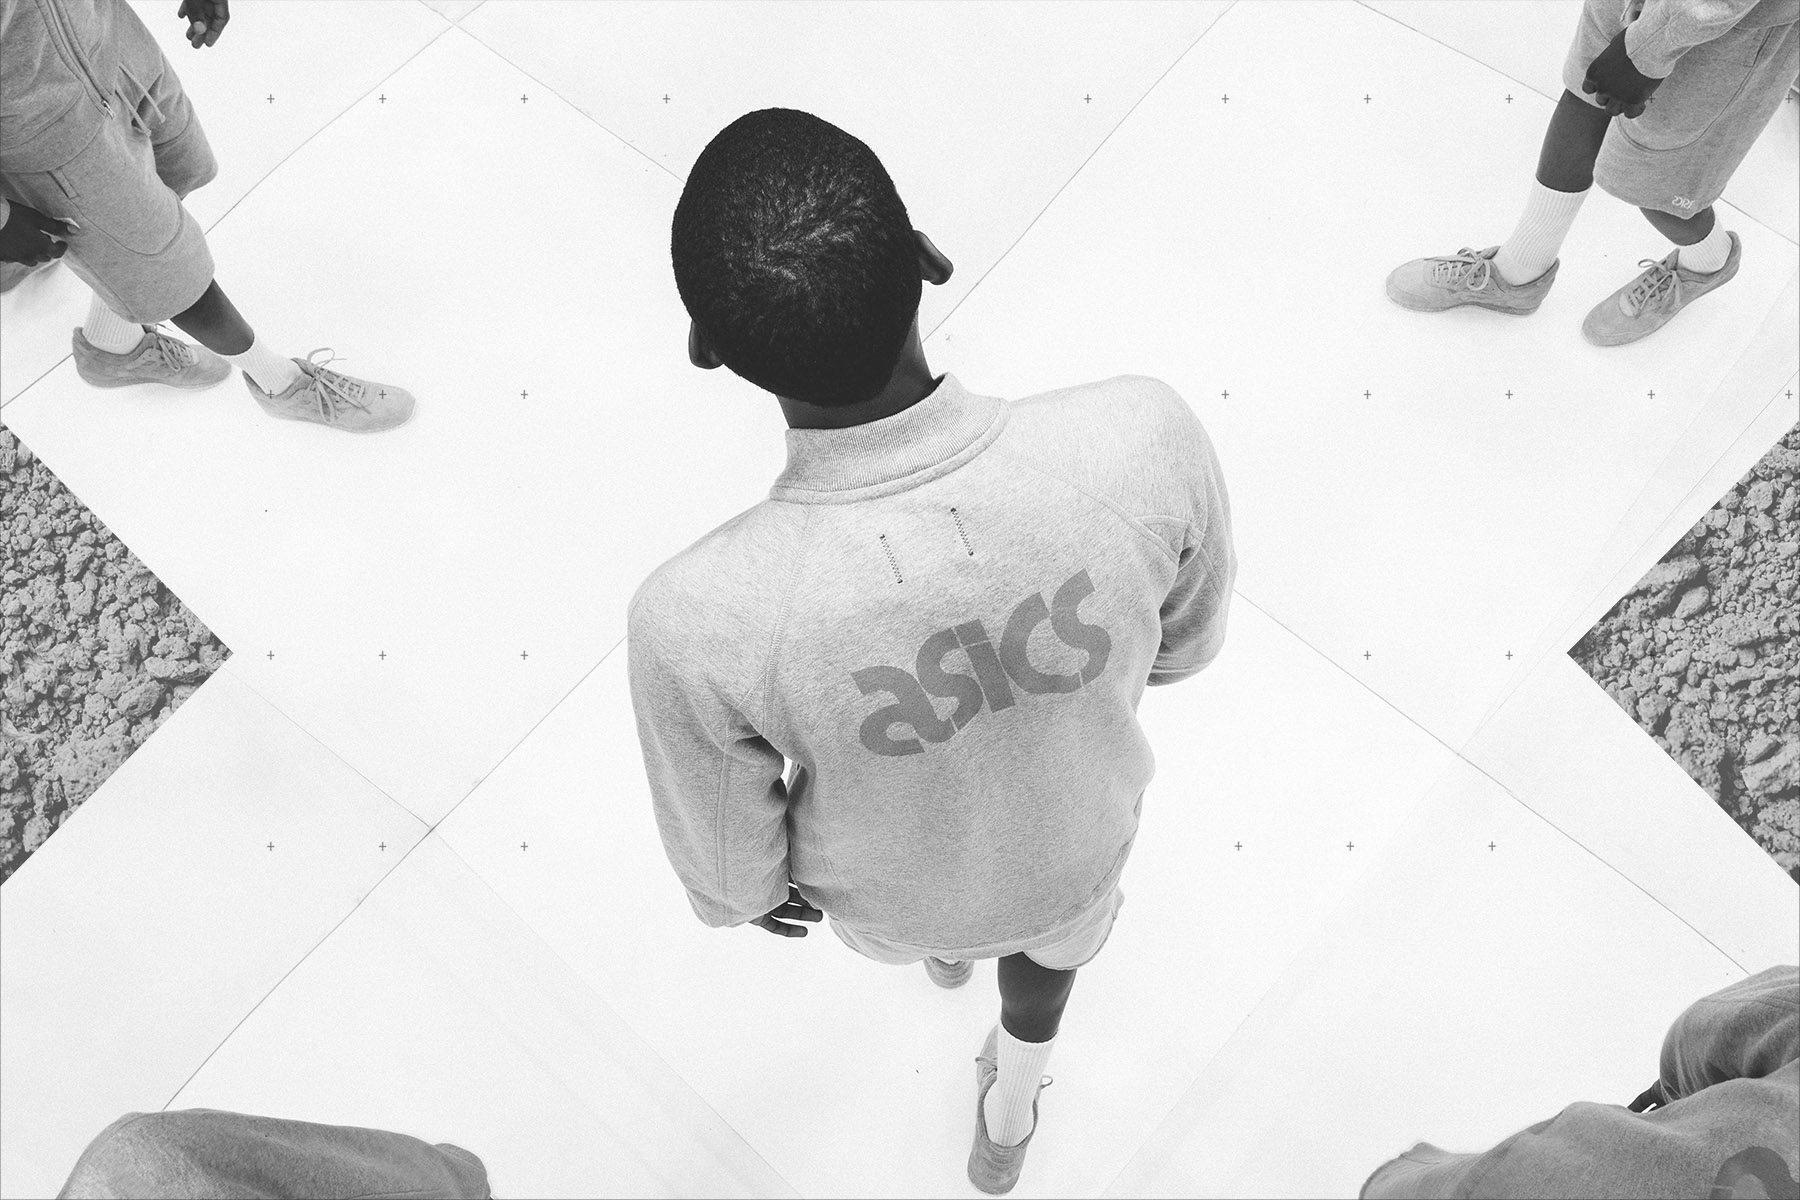 ASICS x REIGNING CHAMP 4